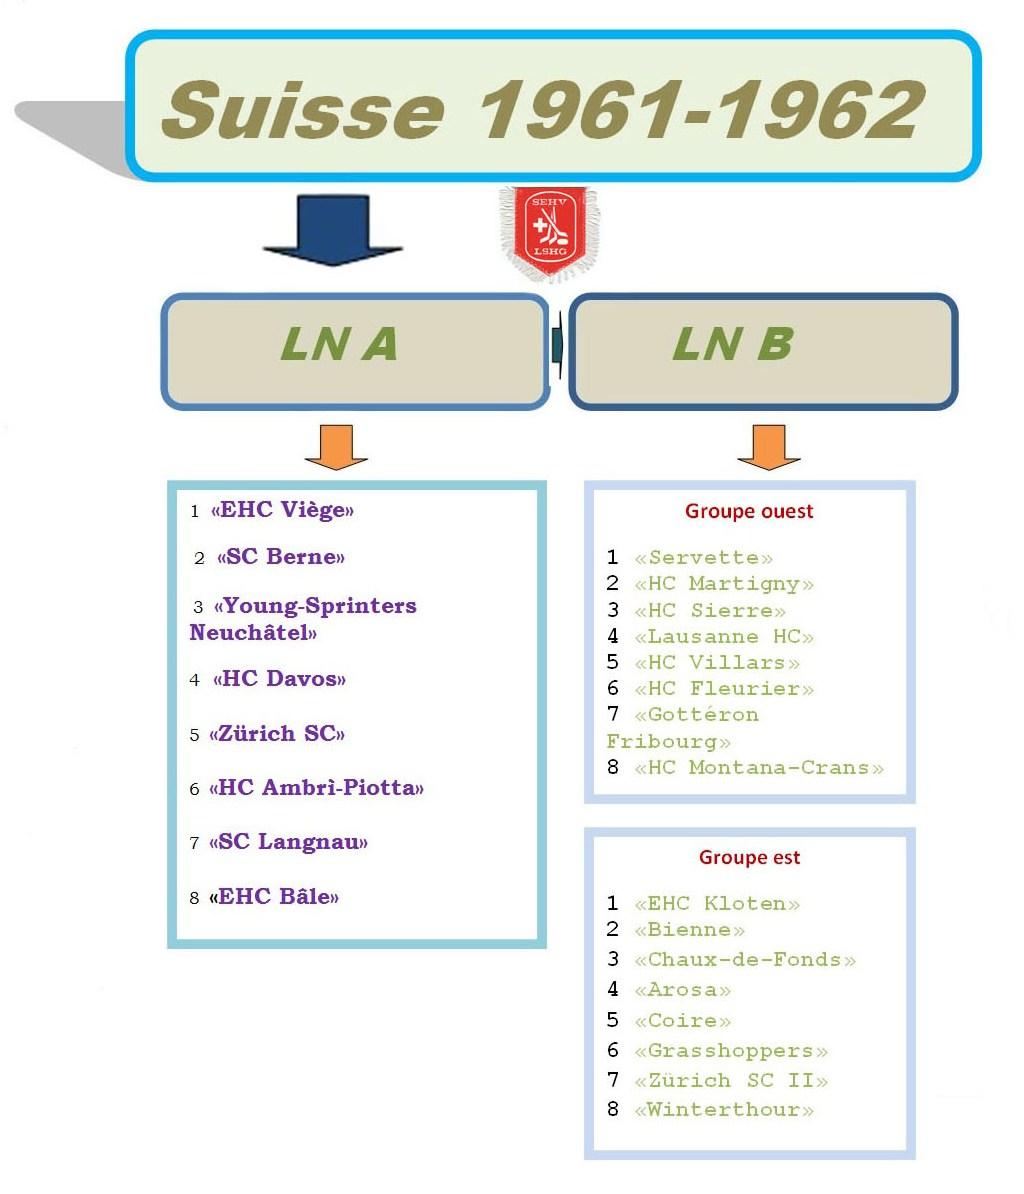 1961-1962.Швейцария-2..jpg